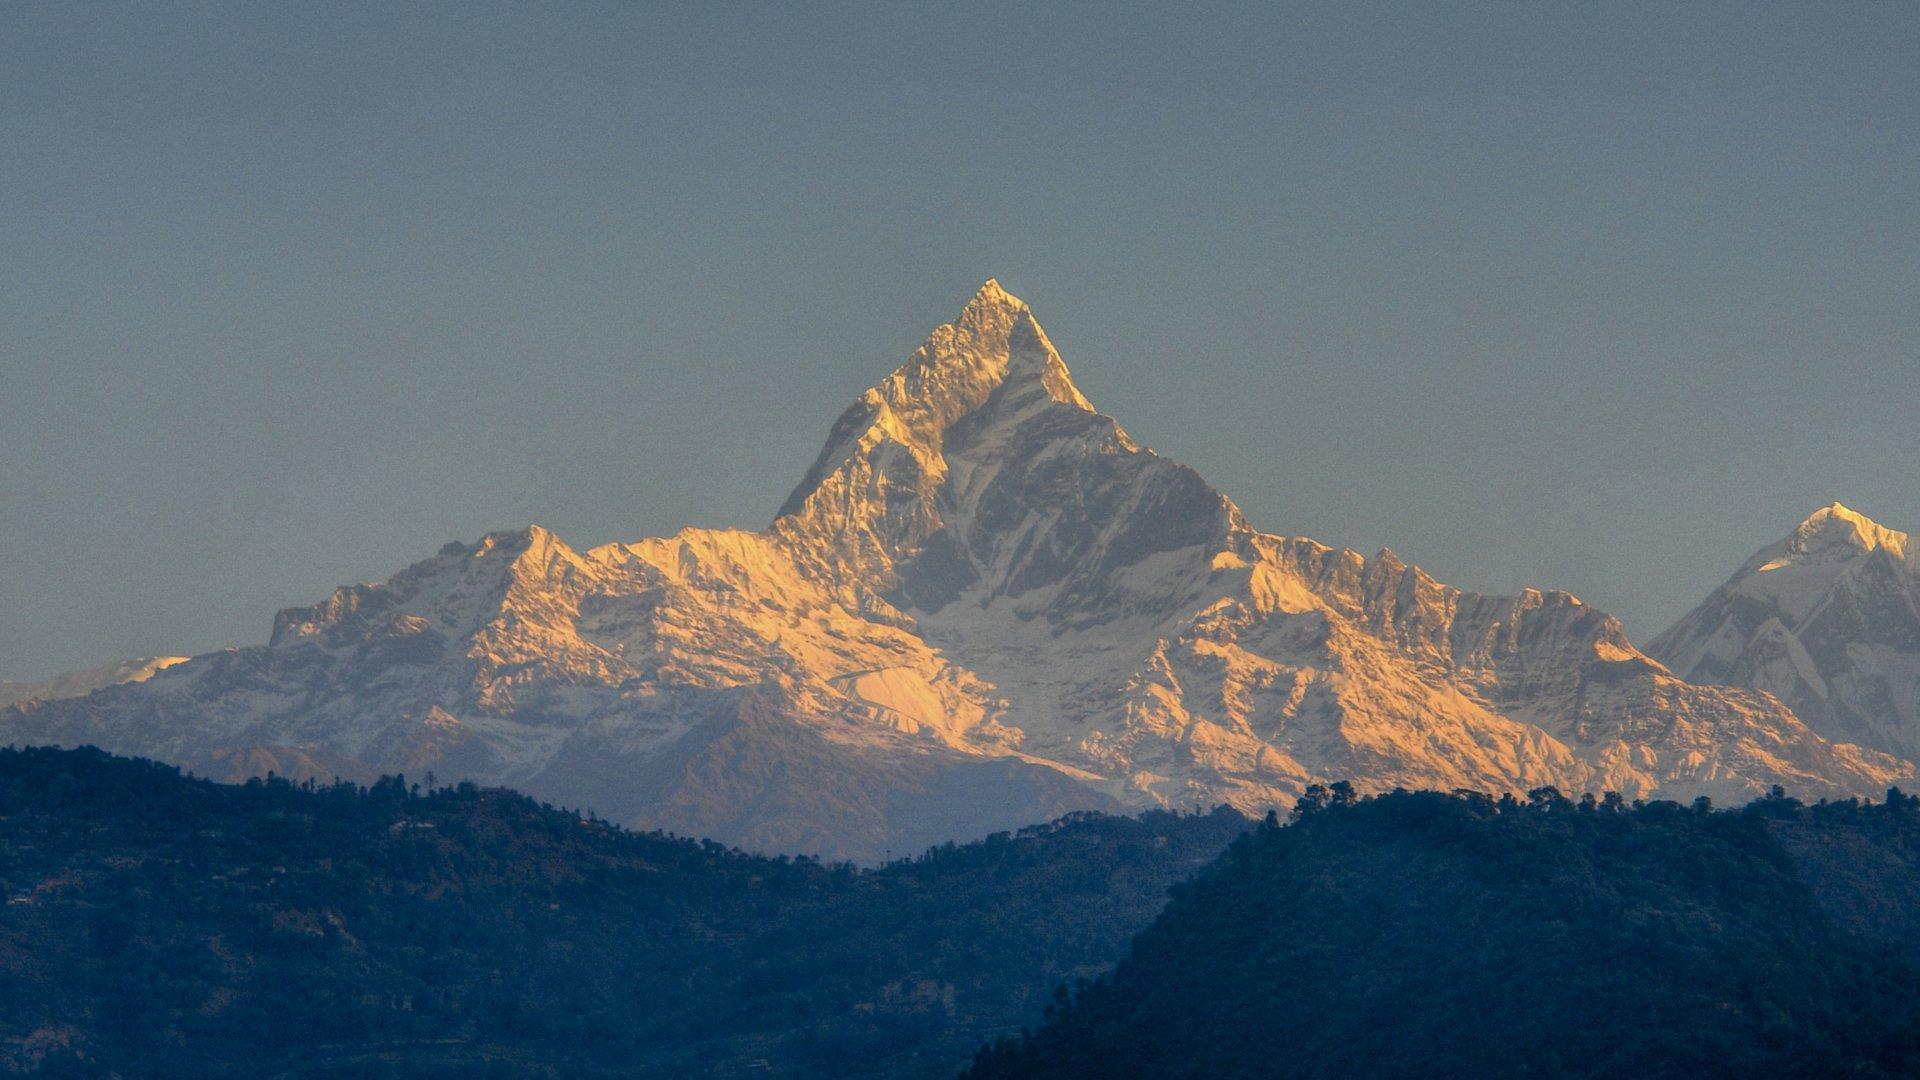 Mountain 4k ultra hd wallpaper background image - Mount everest wallpaper ...